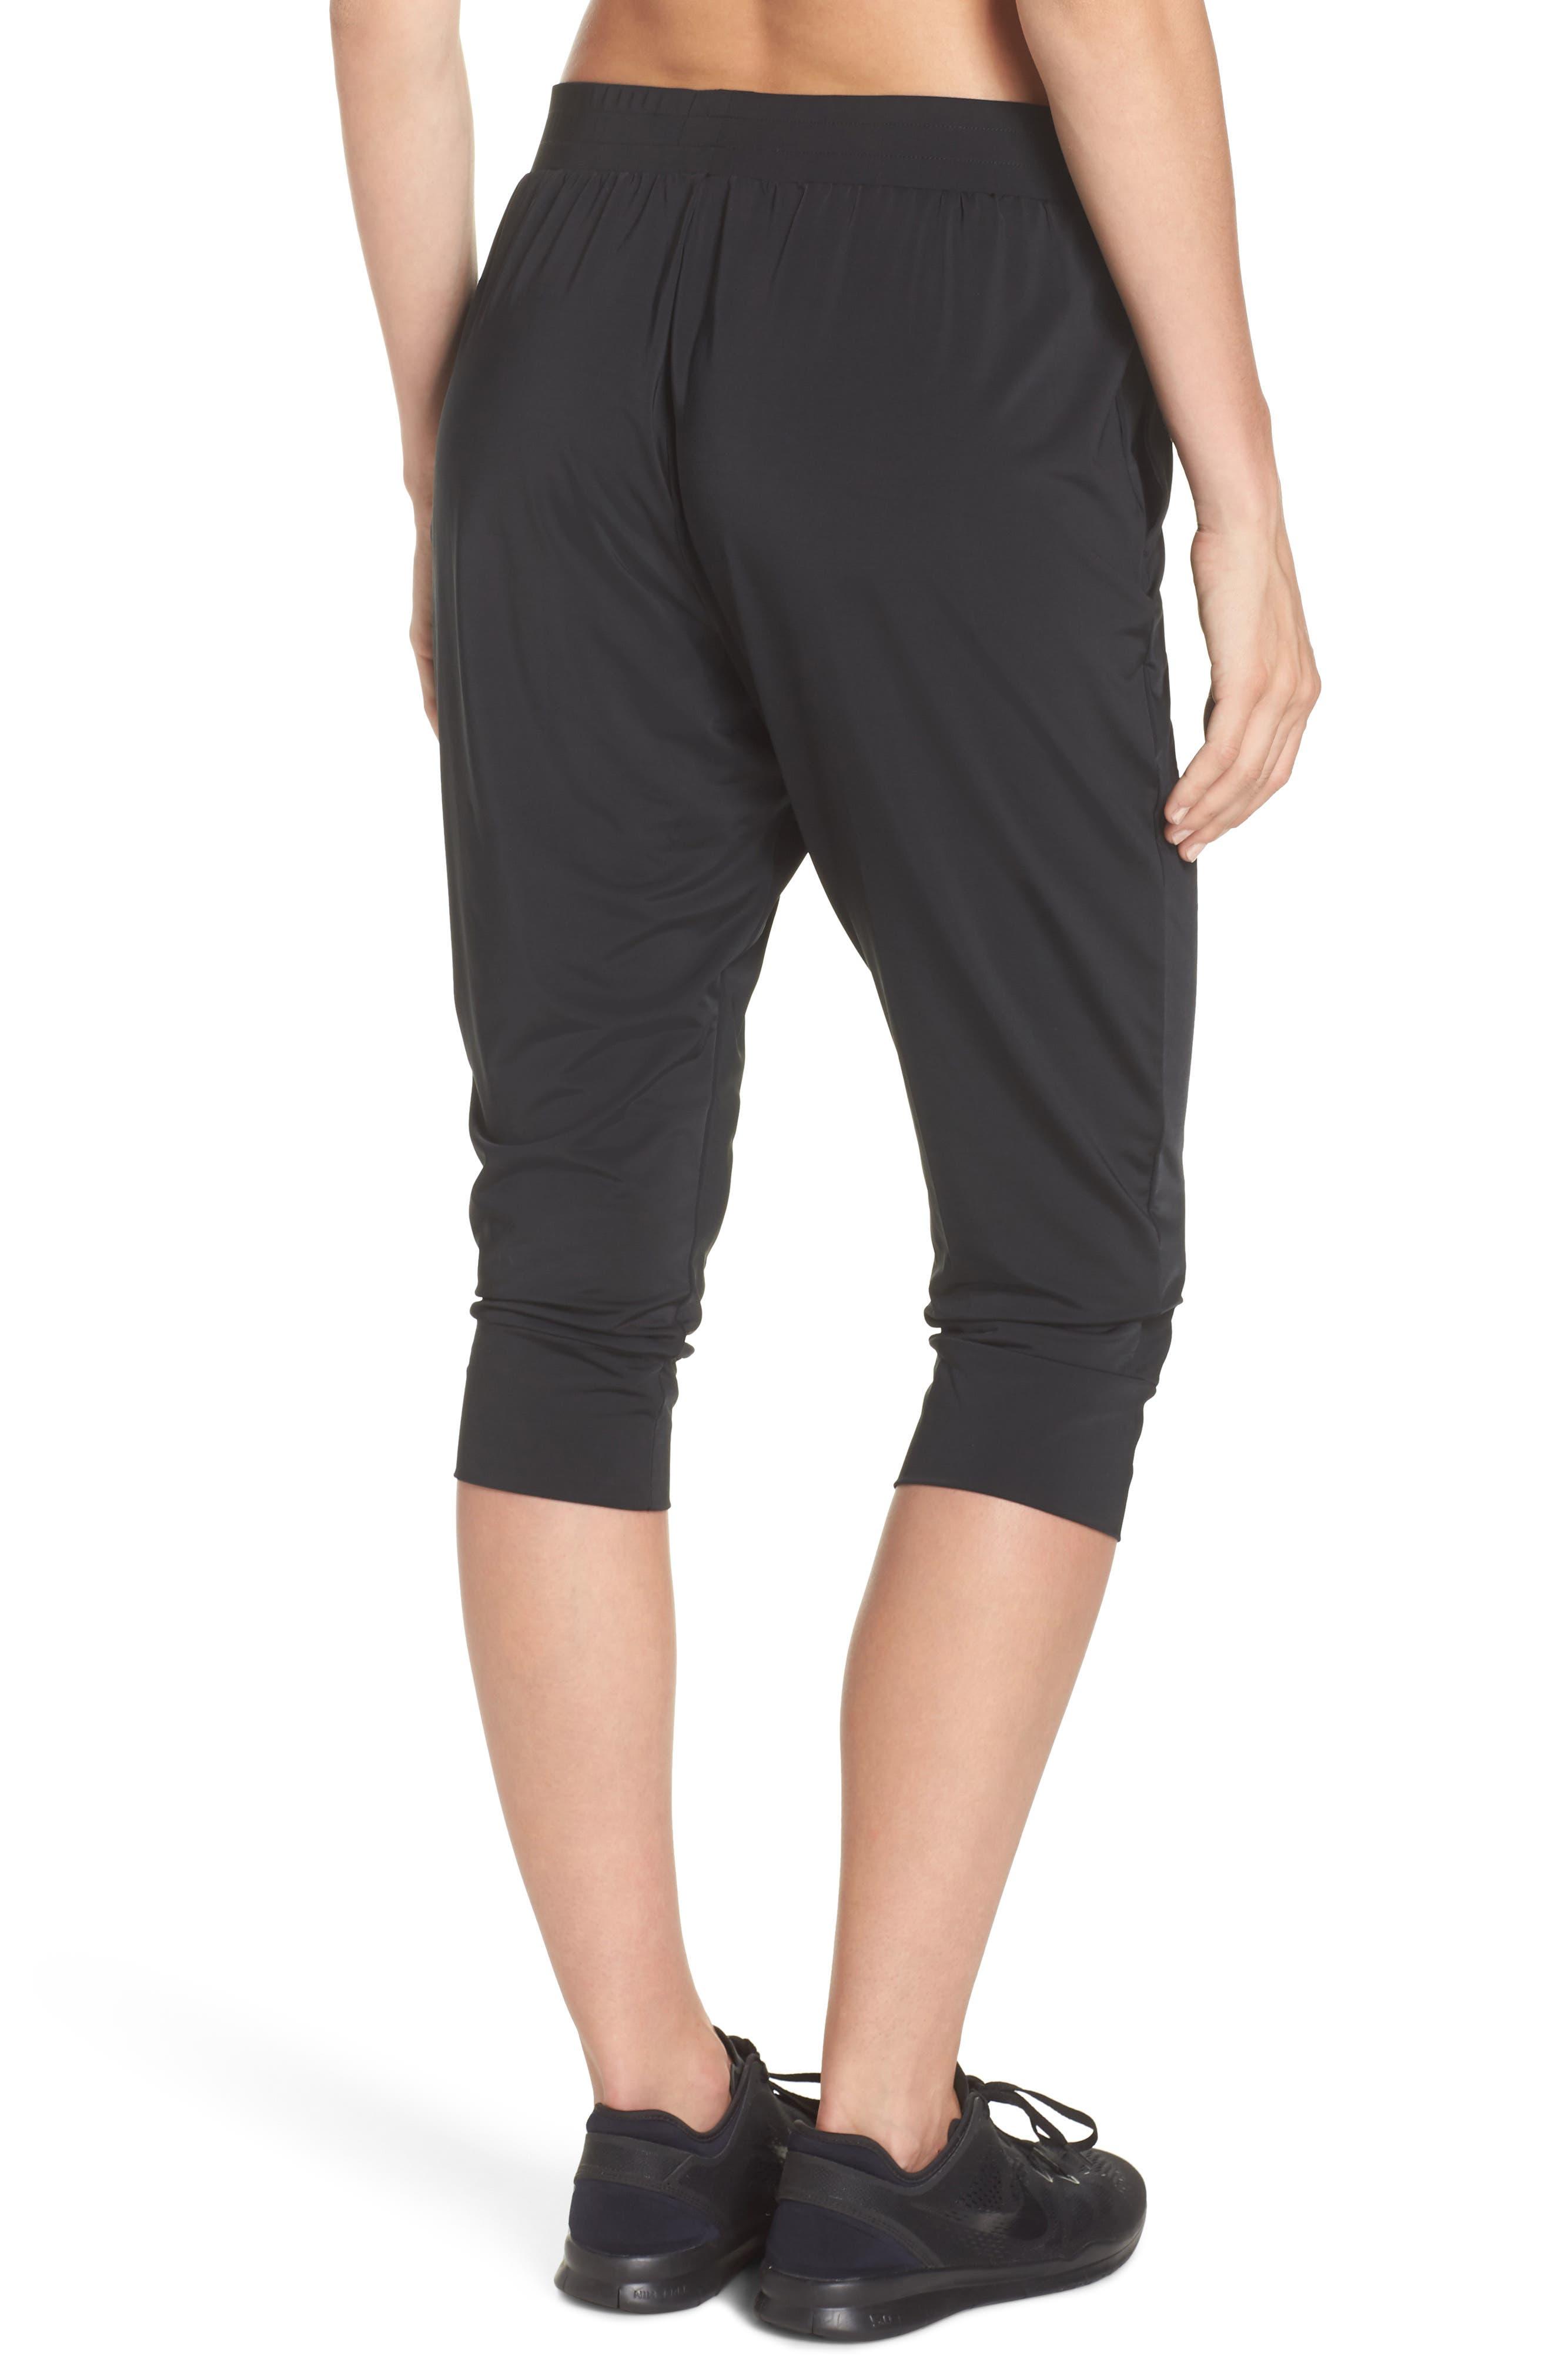 Dry Touch Training Pants,                             Alternate thumbnail 2, color,                             Black/ Black